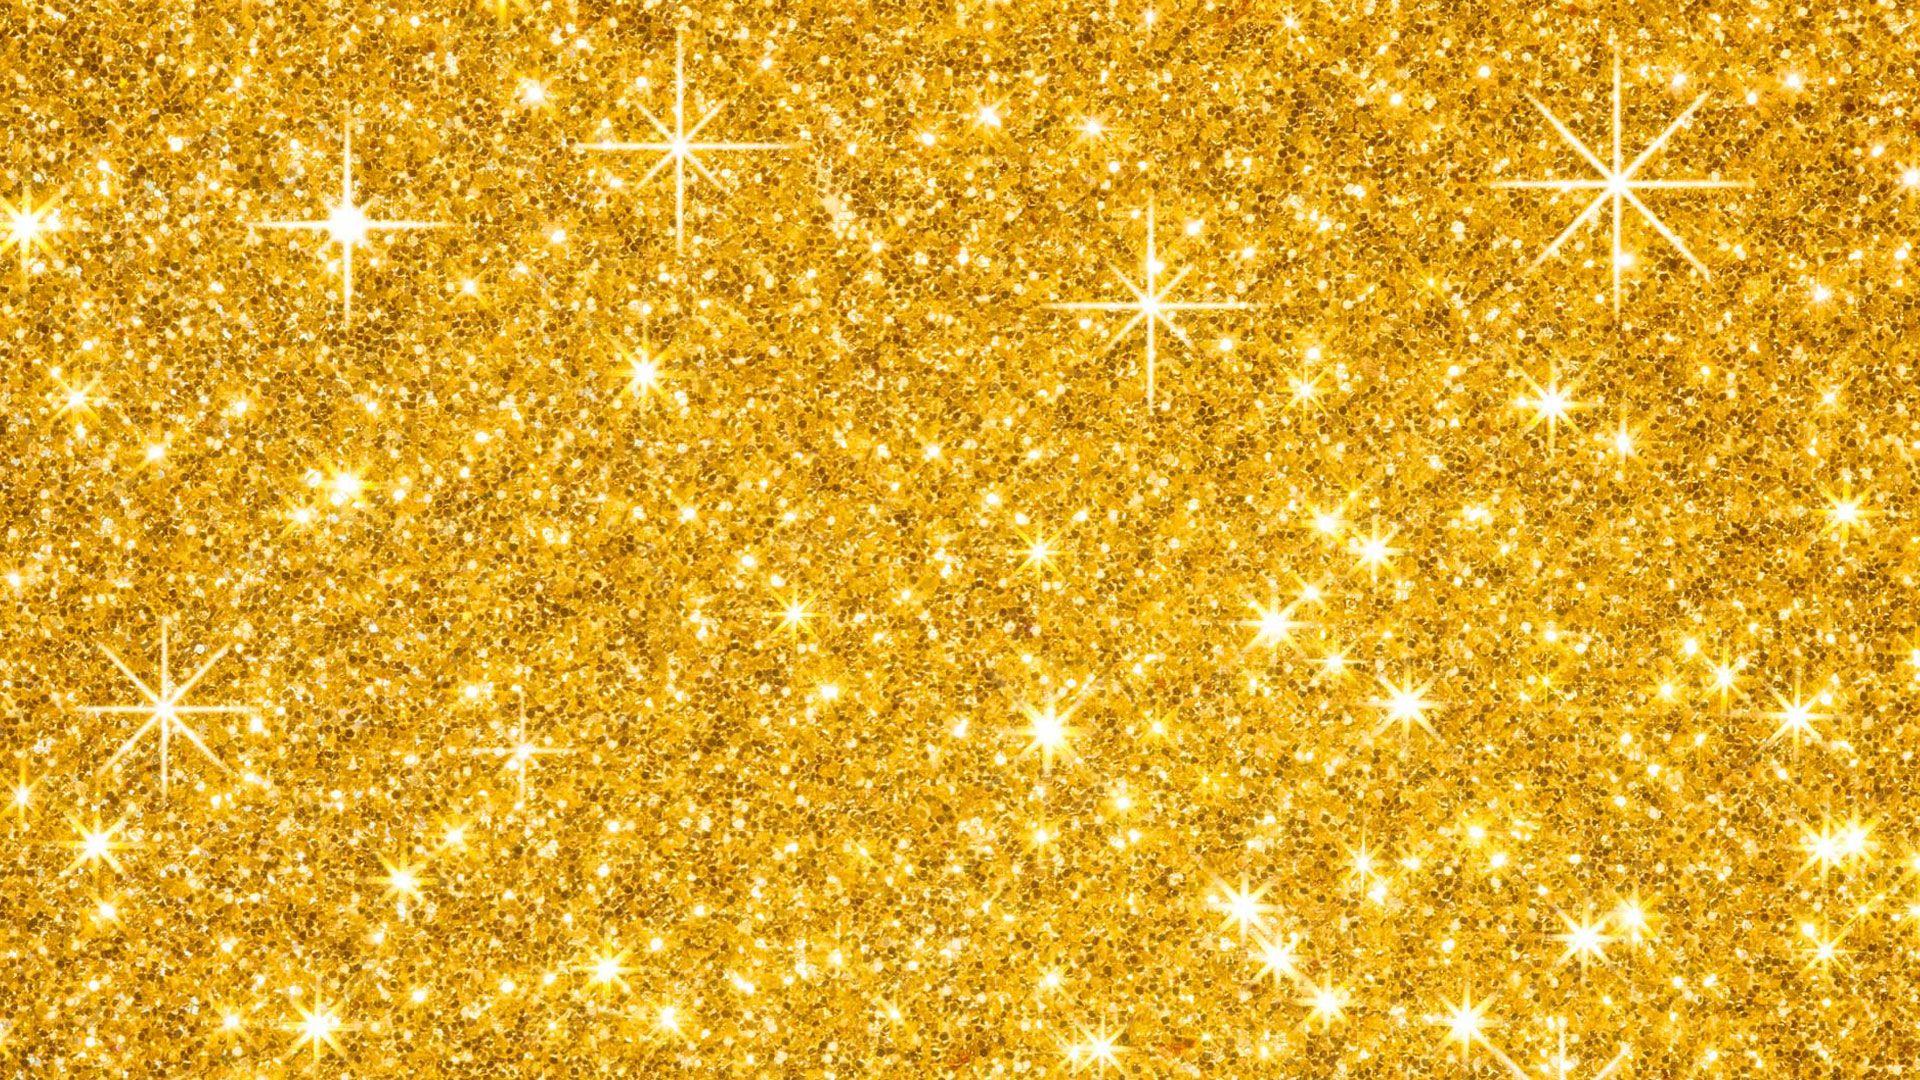 Best Free Live Wallpapers Iphone X Gold Wallpaper Desktop Eij Patterns Amp Backgrounds In